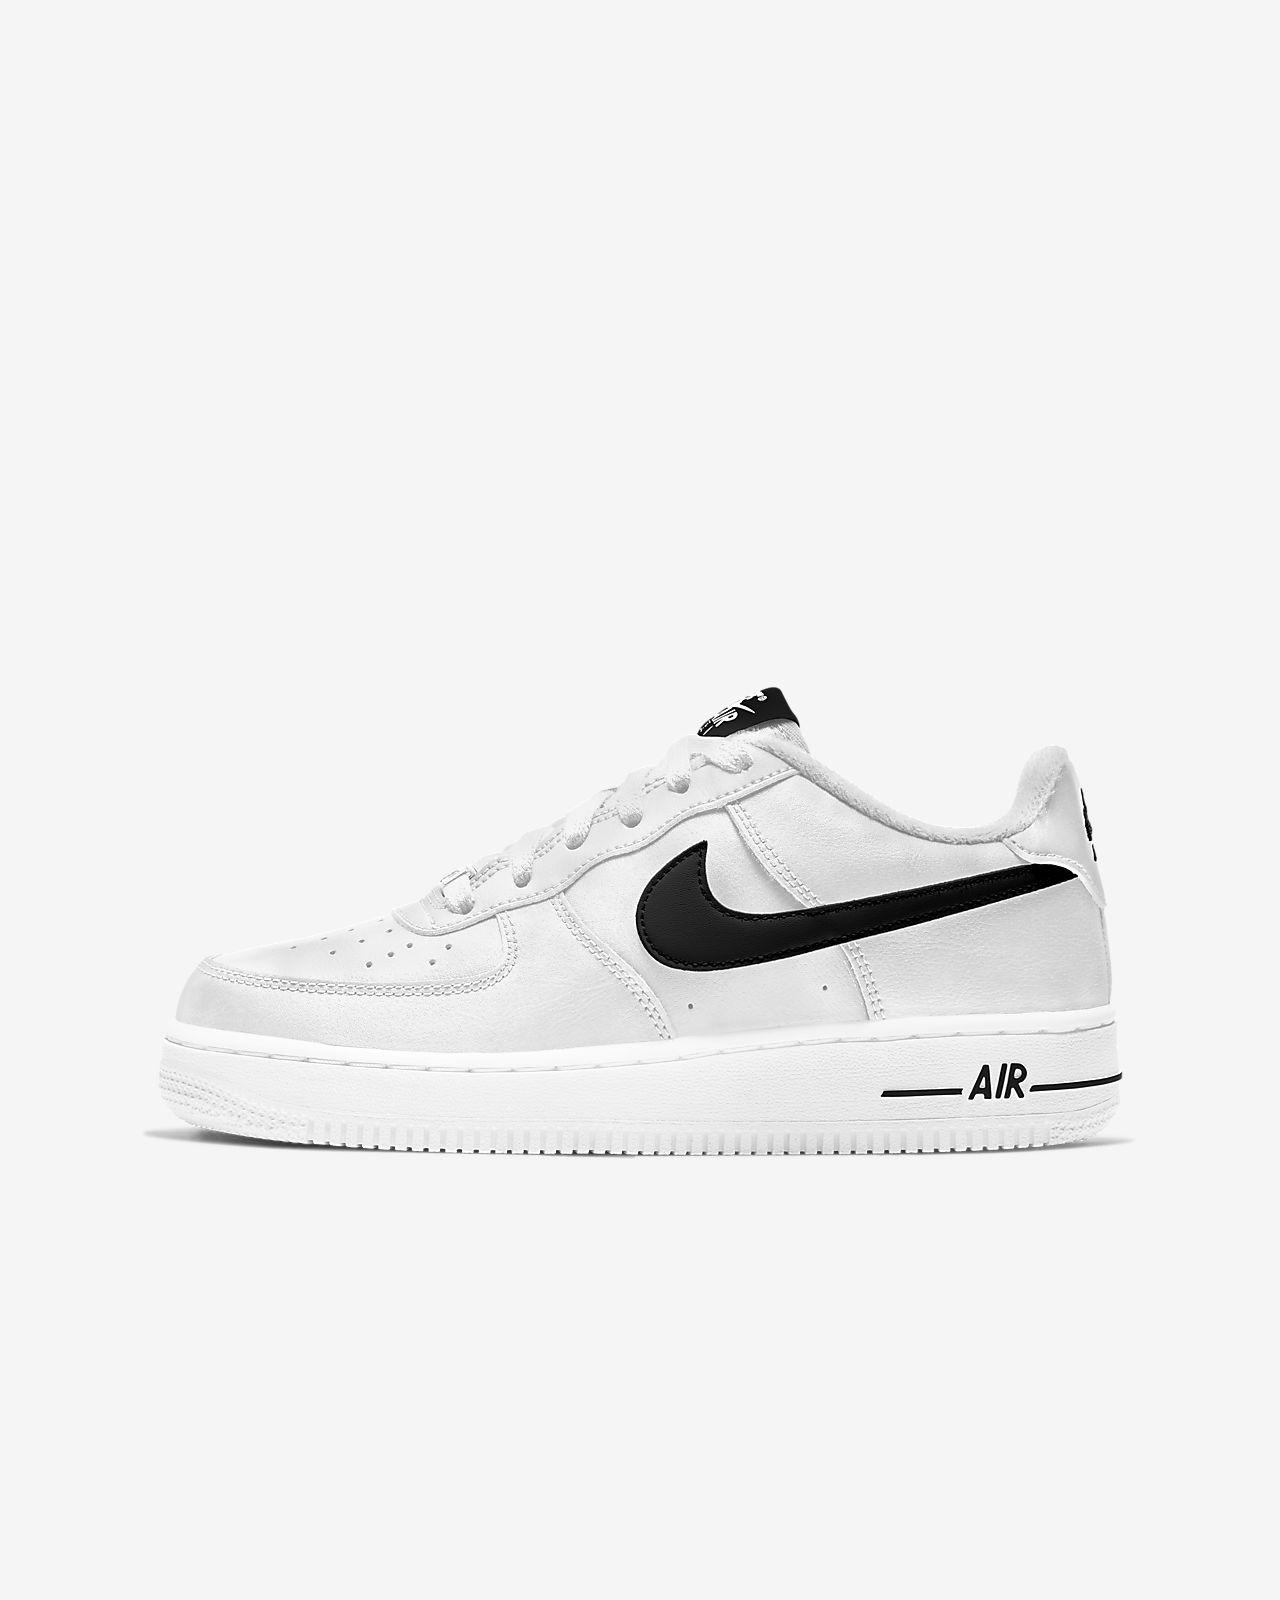 Nike Air Force 1 Schuh Fur Altere Kinder Nike De In 2020 Nike Air Force Kids Shoes Nike